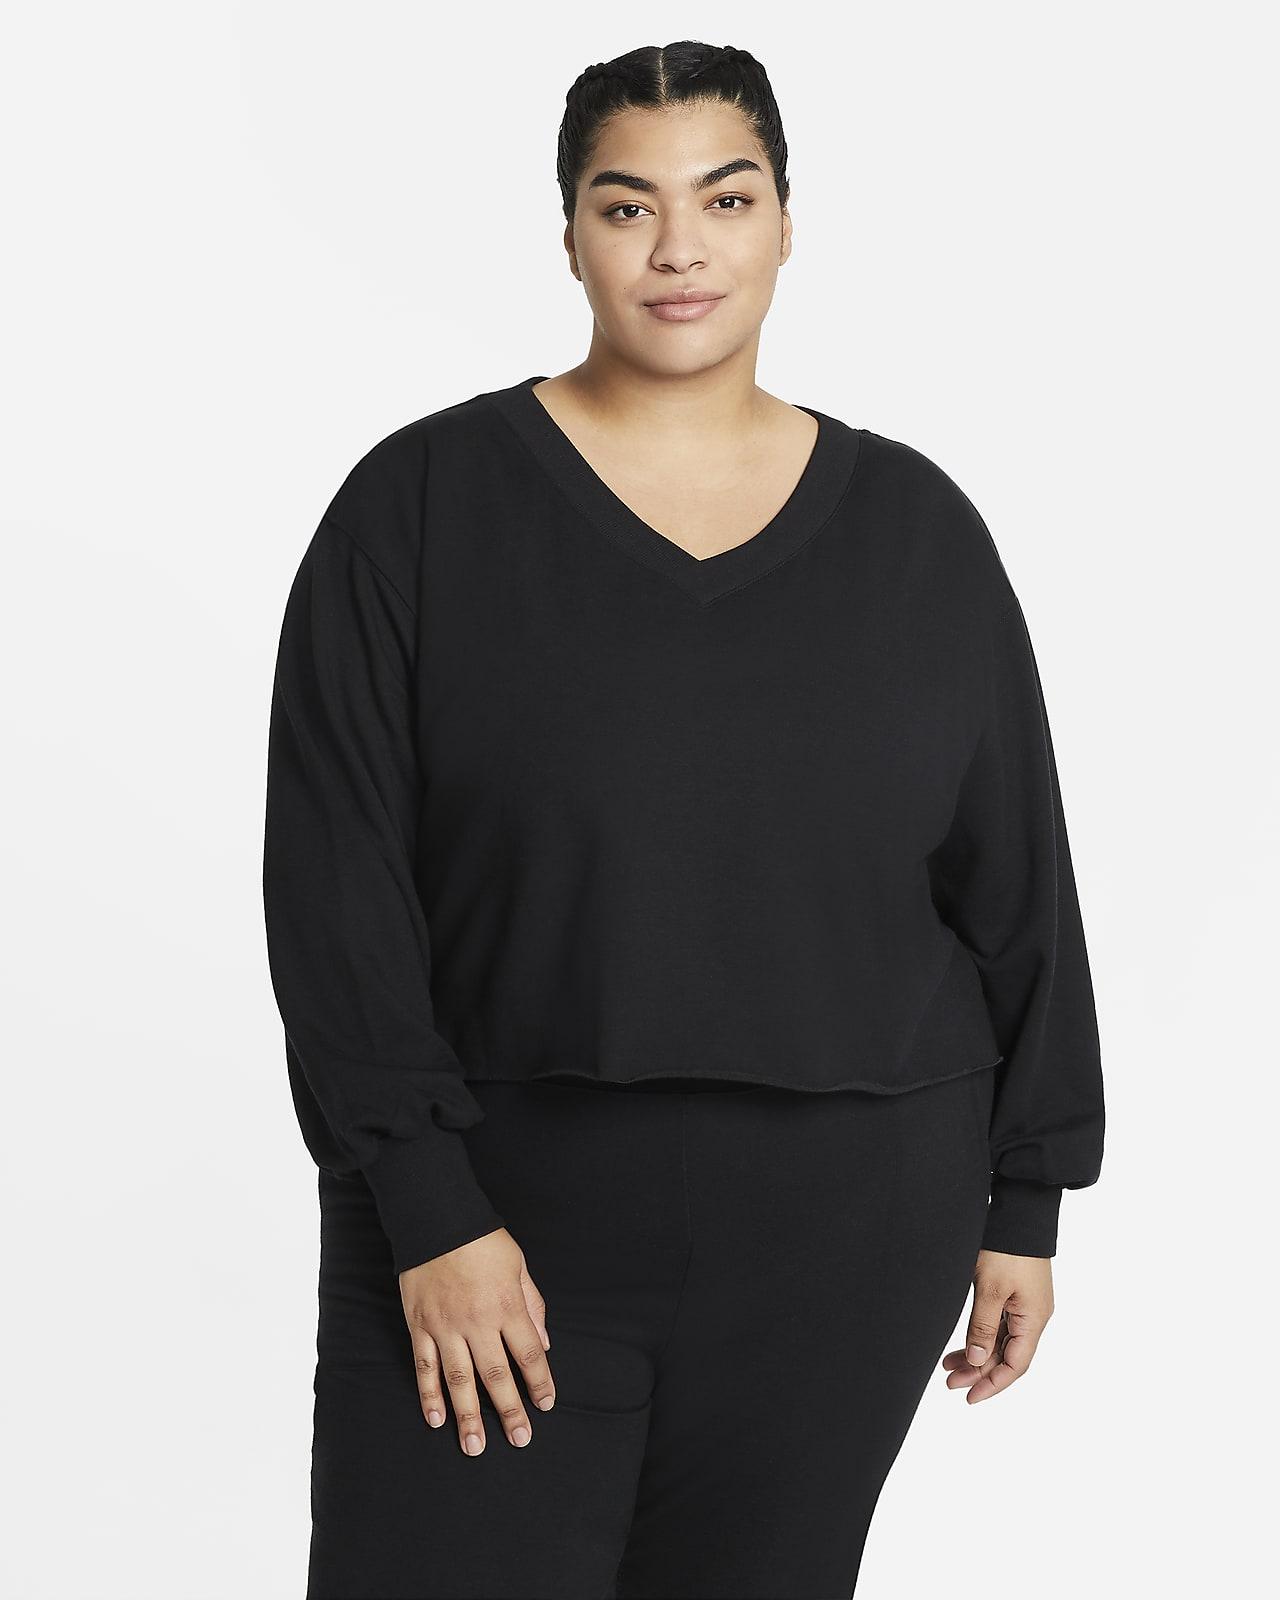 Nike Yoga Luxe Women's Fleece V-Neck Top (Plus Size)